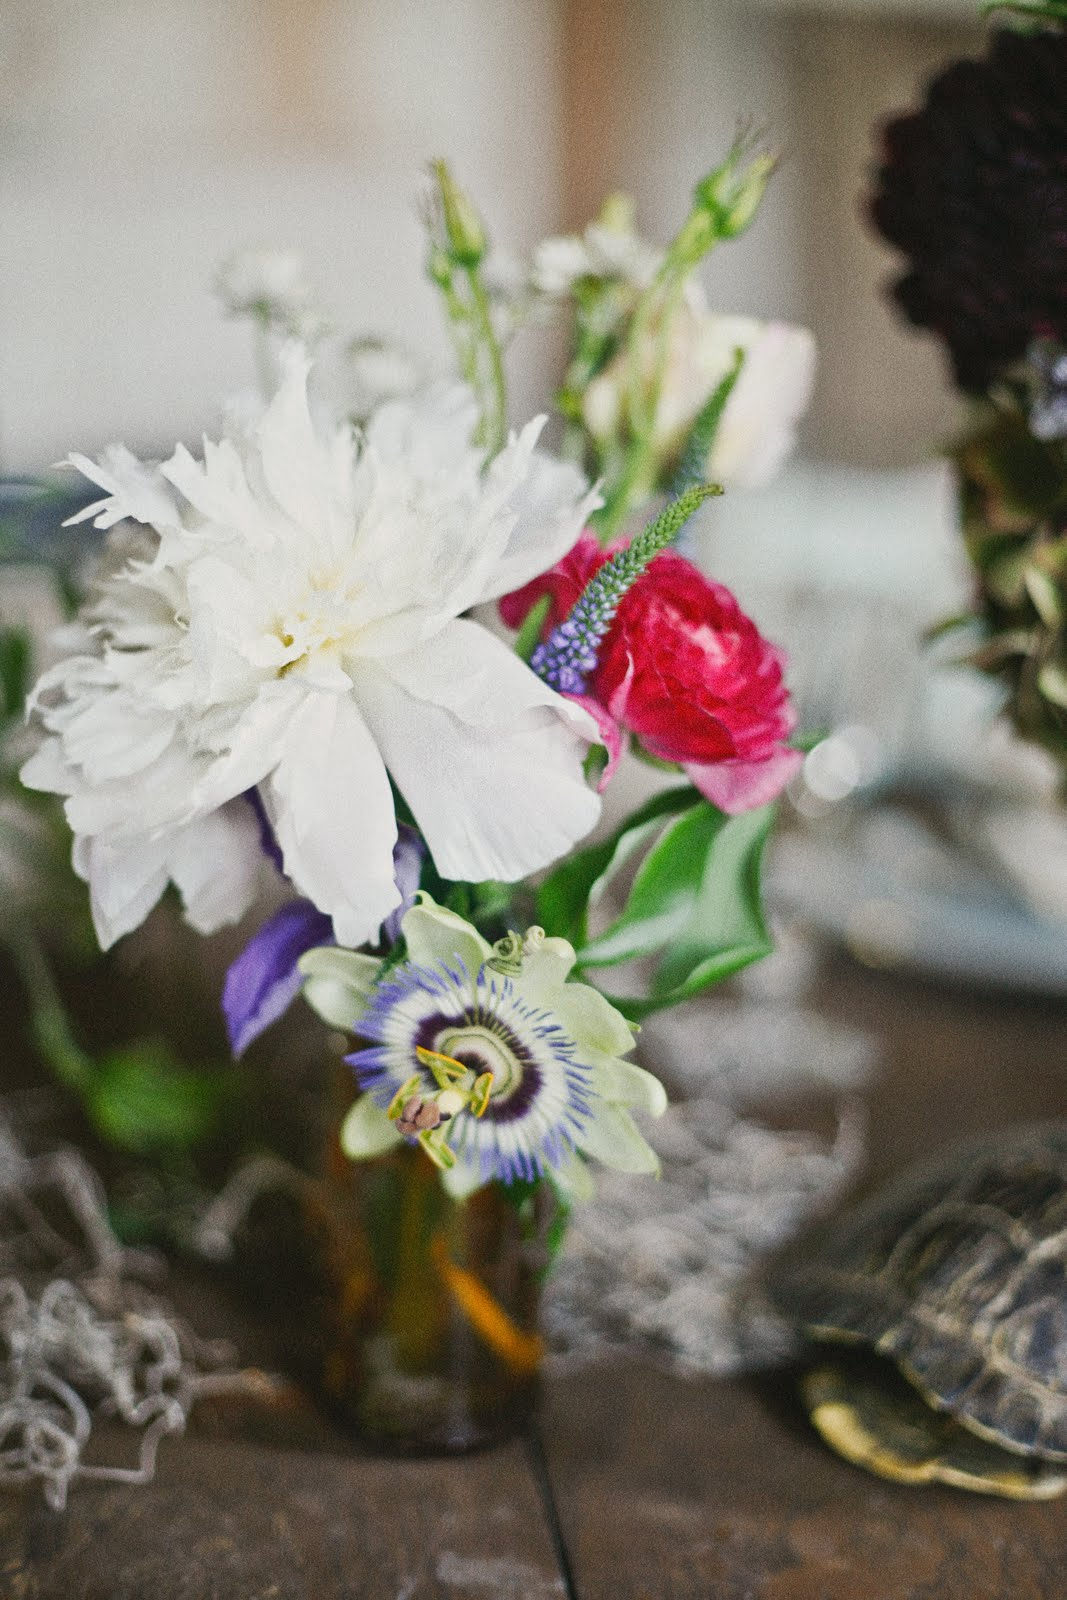 botanical_noir shoot_apryl ann_rent my dust_vintage rental (6).jpg